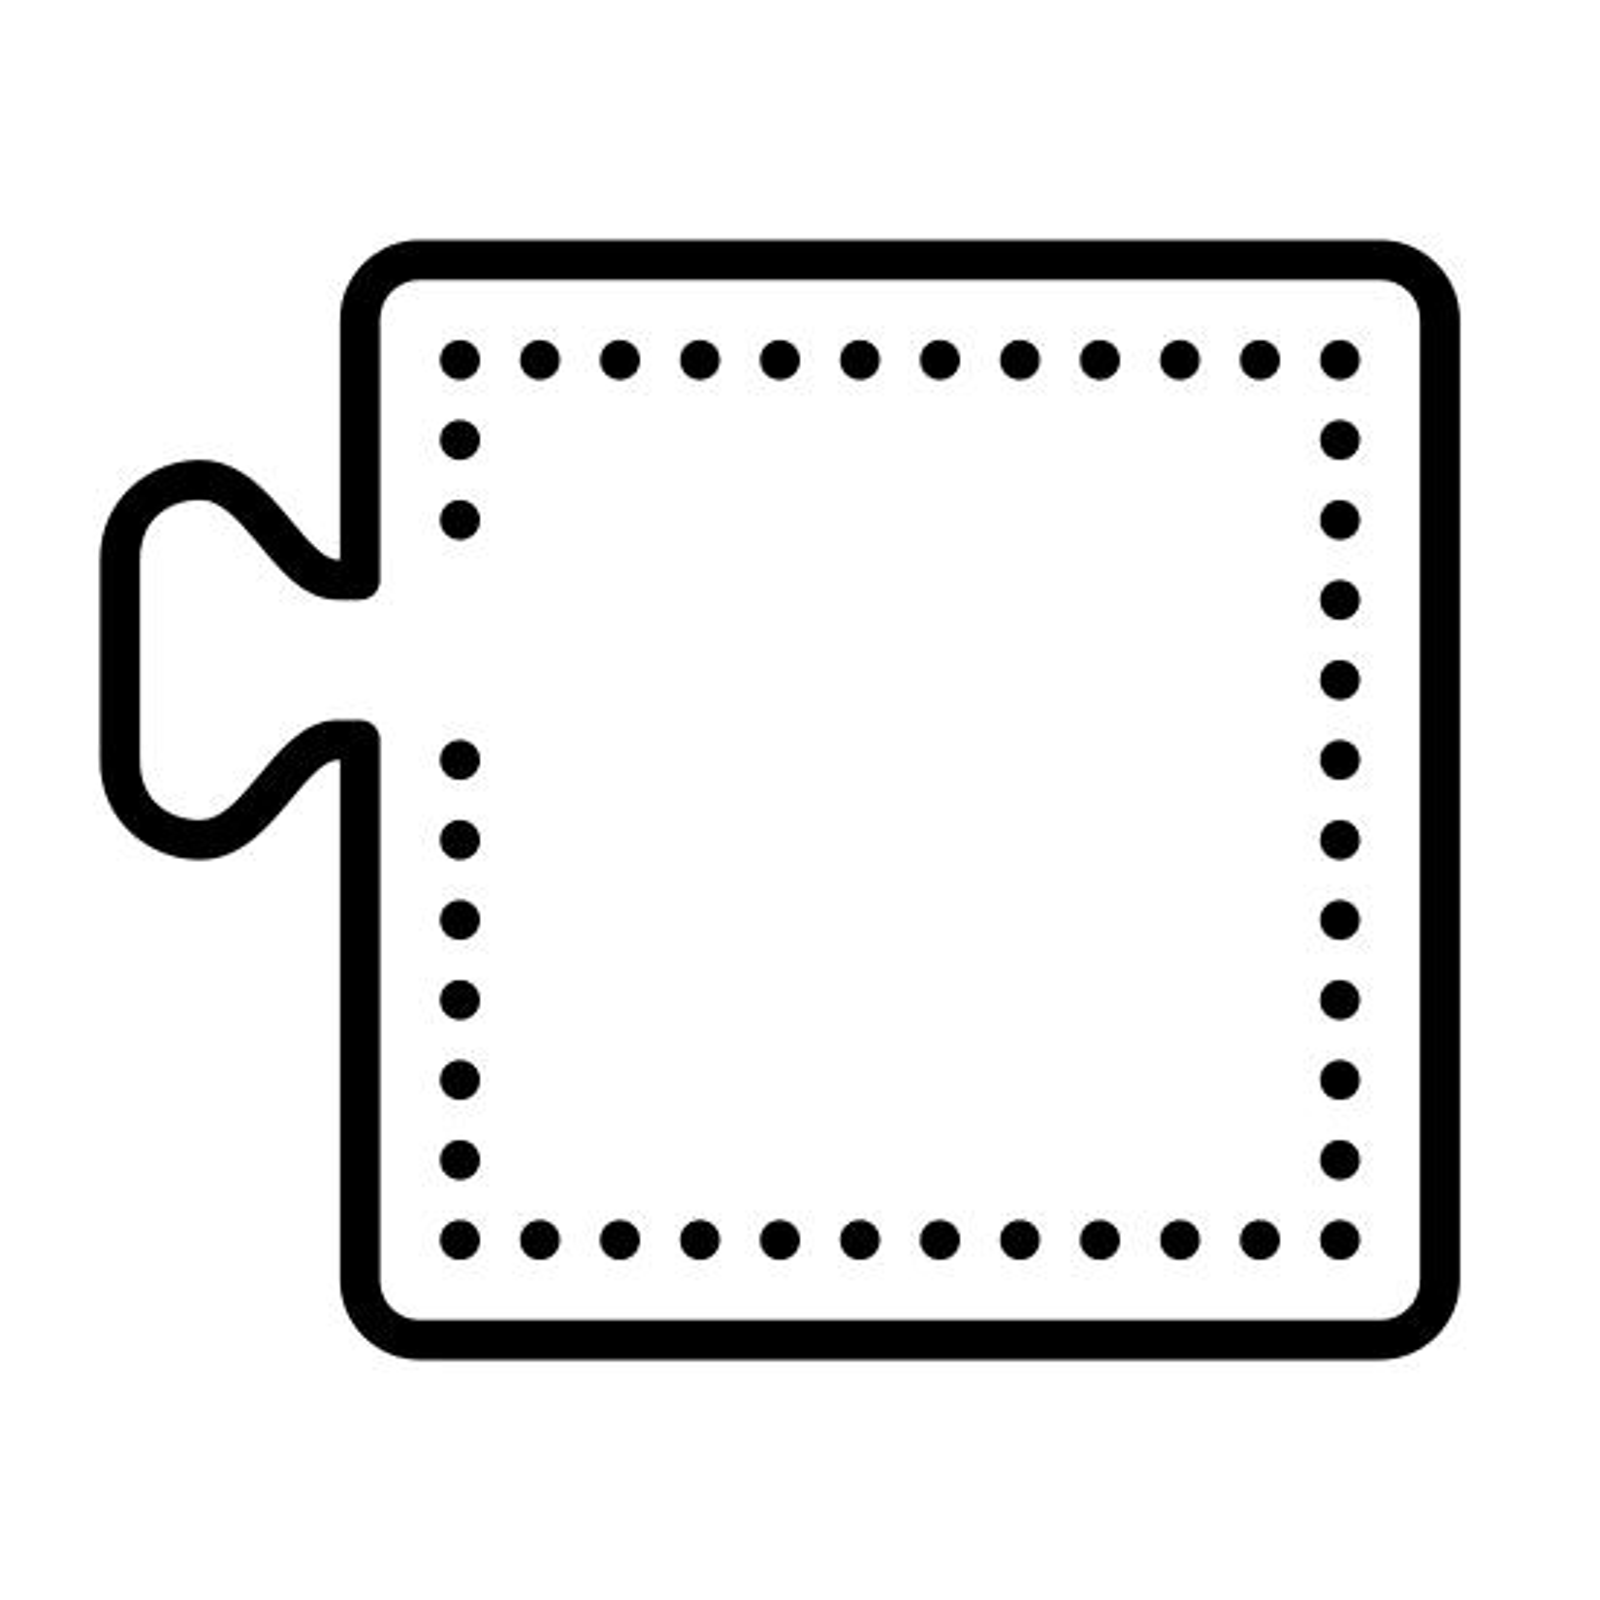 Blockly Orange icon